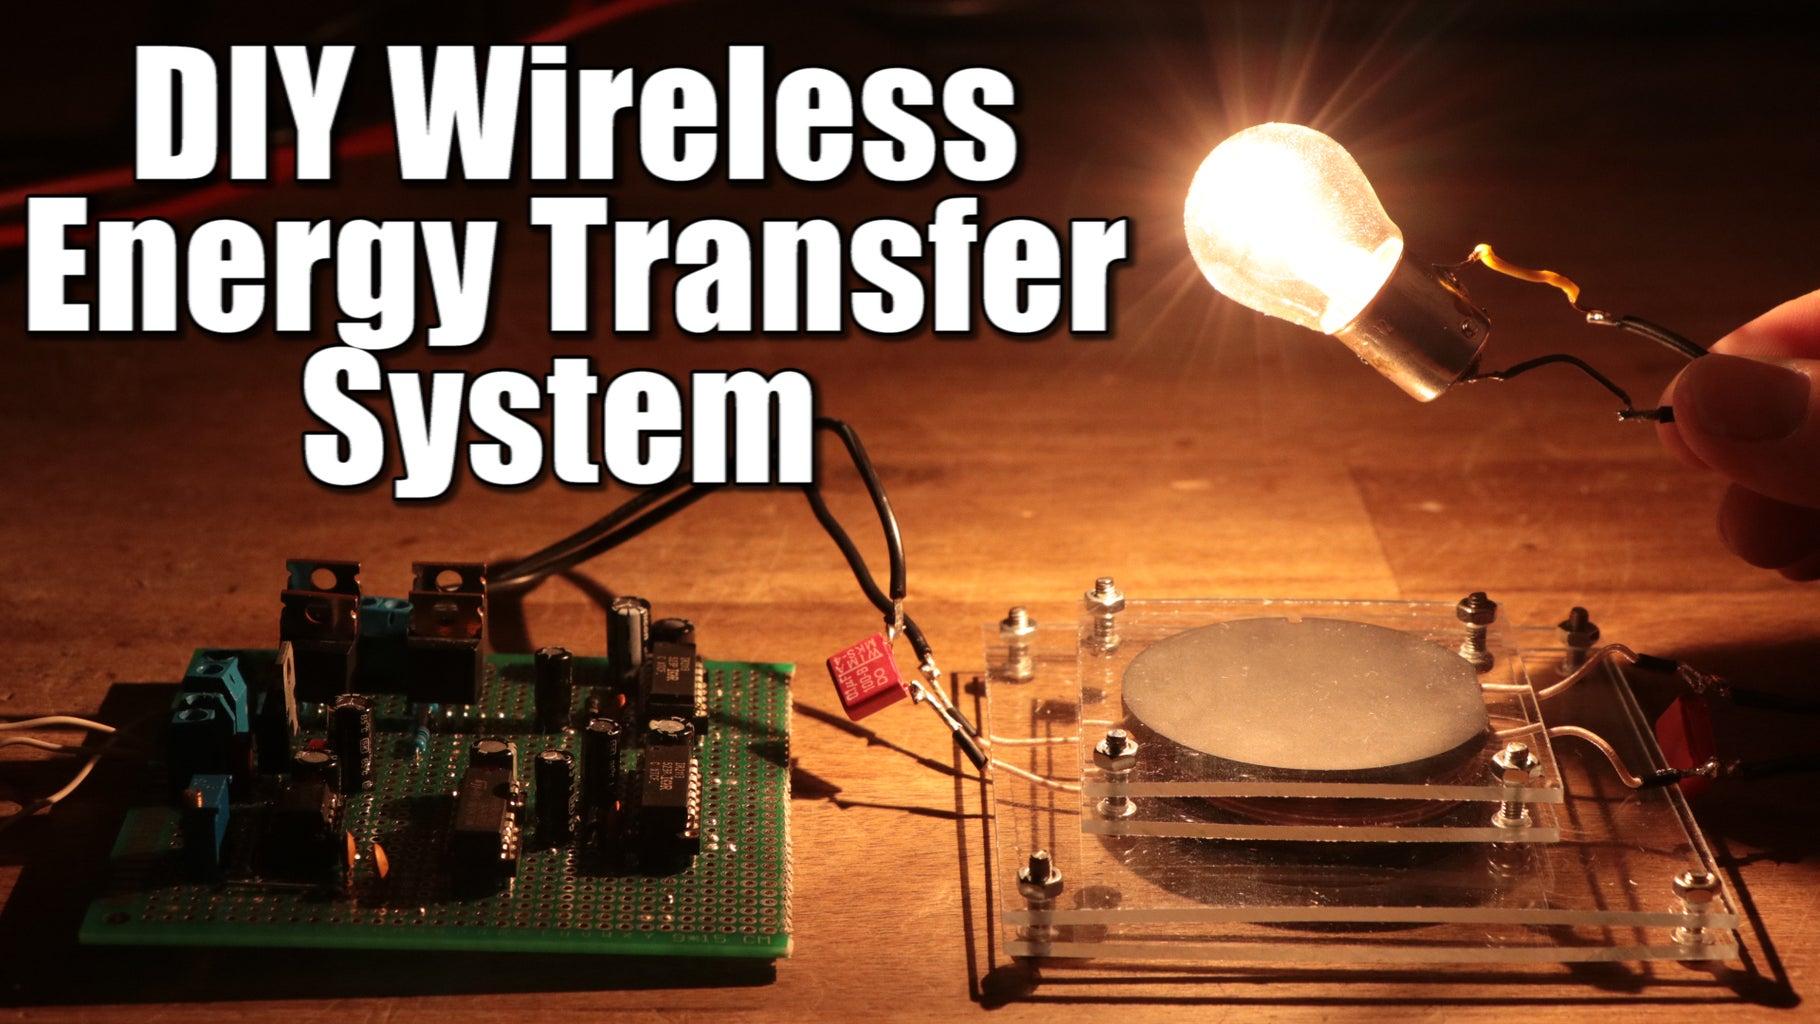 DIY Wireless Energy Transfer System